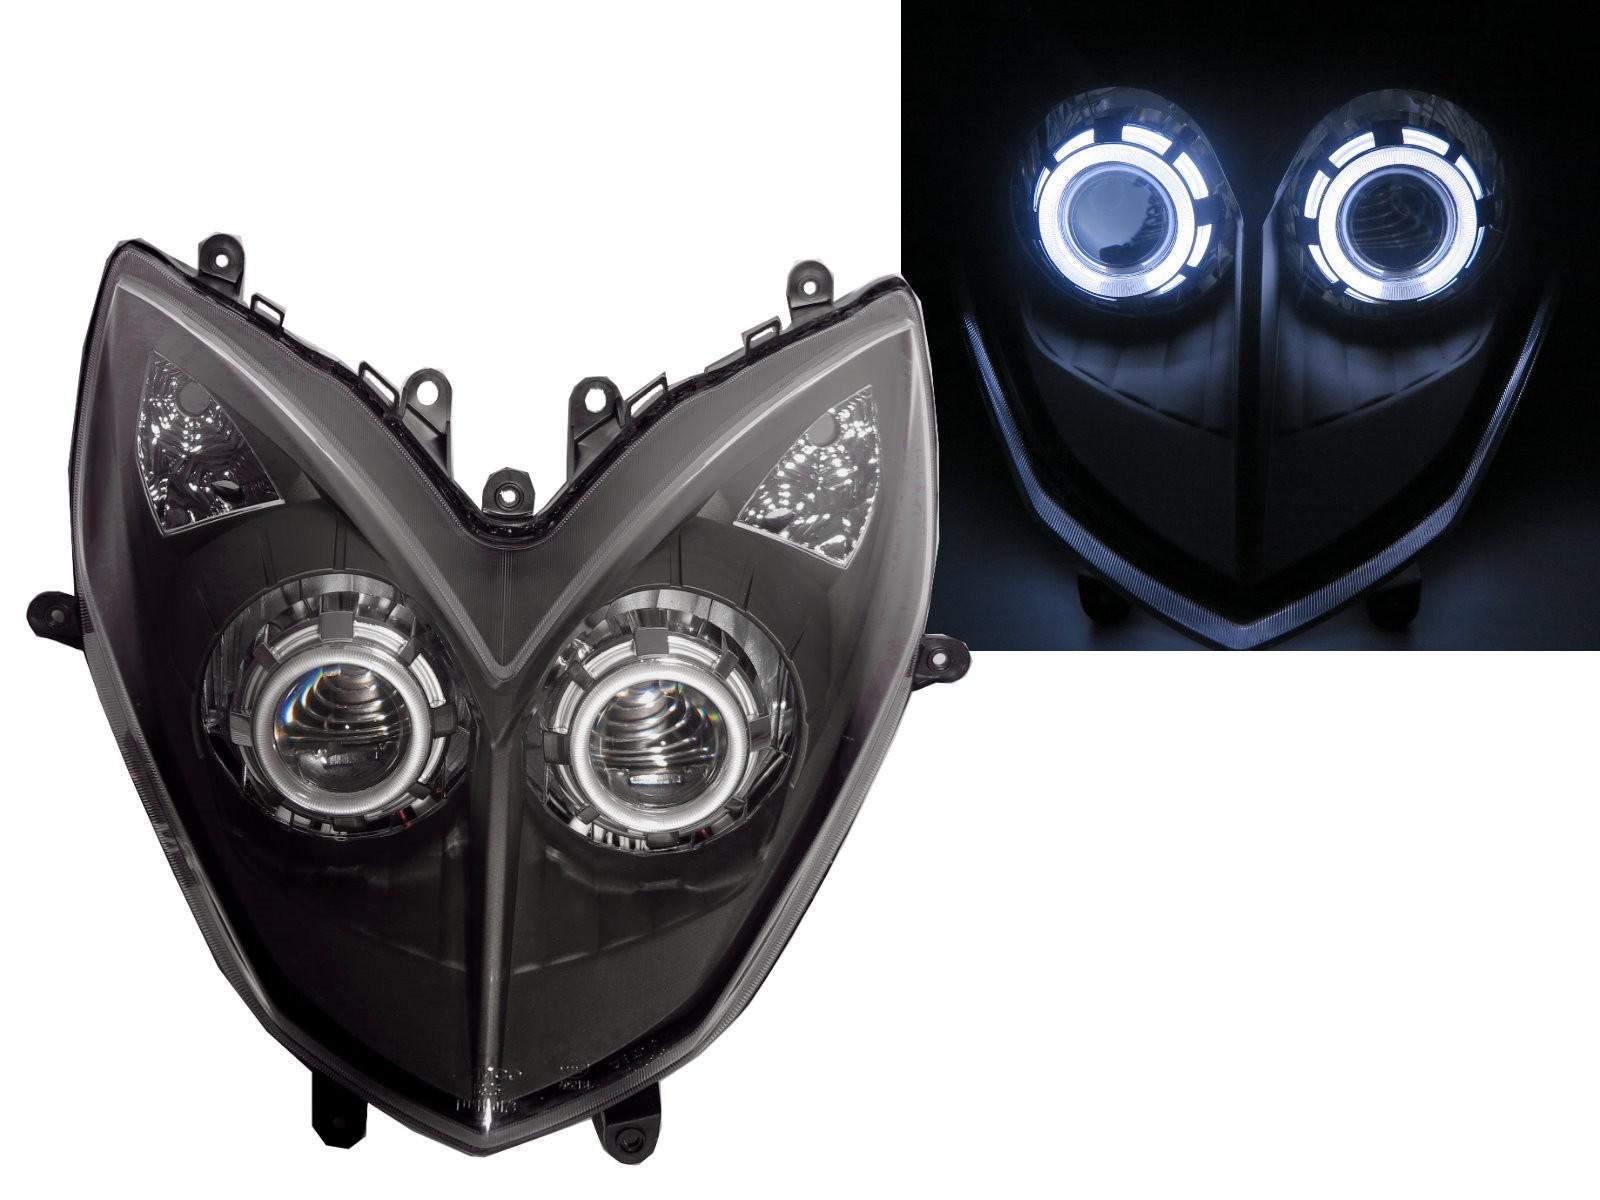 CrazyTheGod Movie 2013-2014 Motorcycles CCFL Projector LED Headlight Headlamp Black for KYMCO